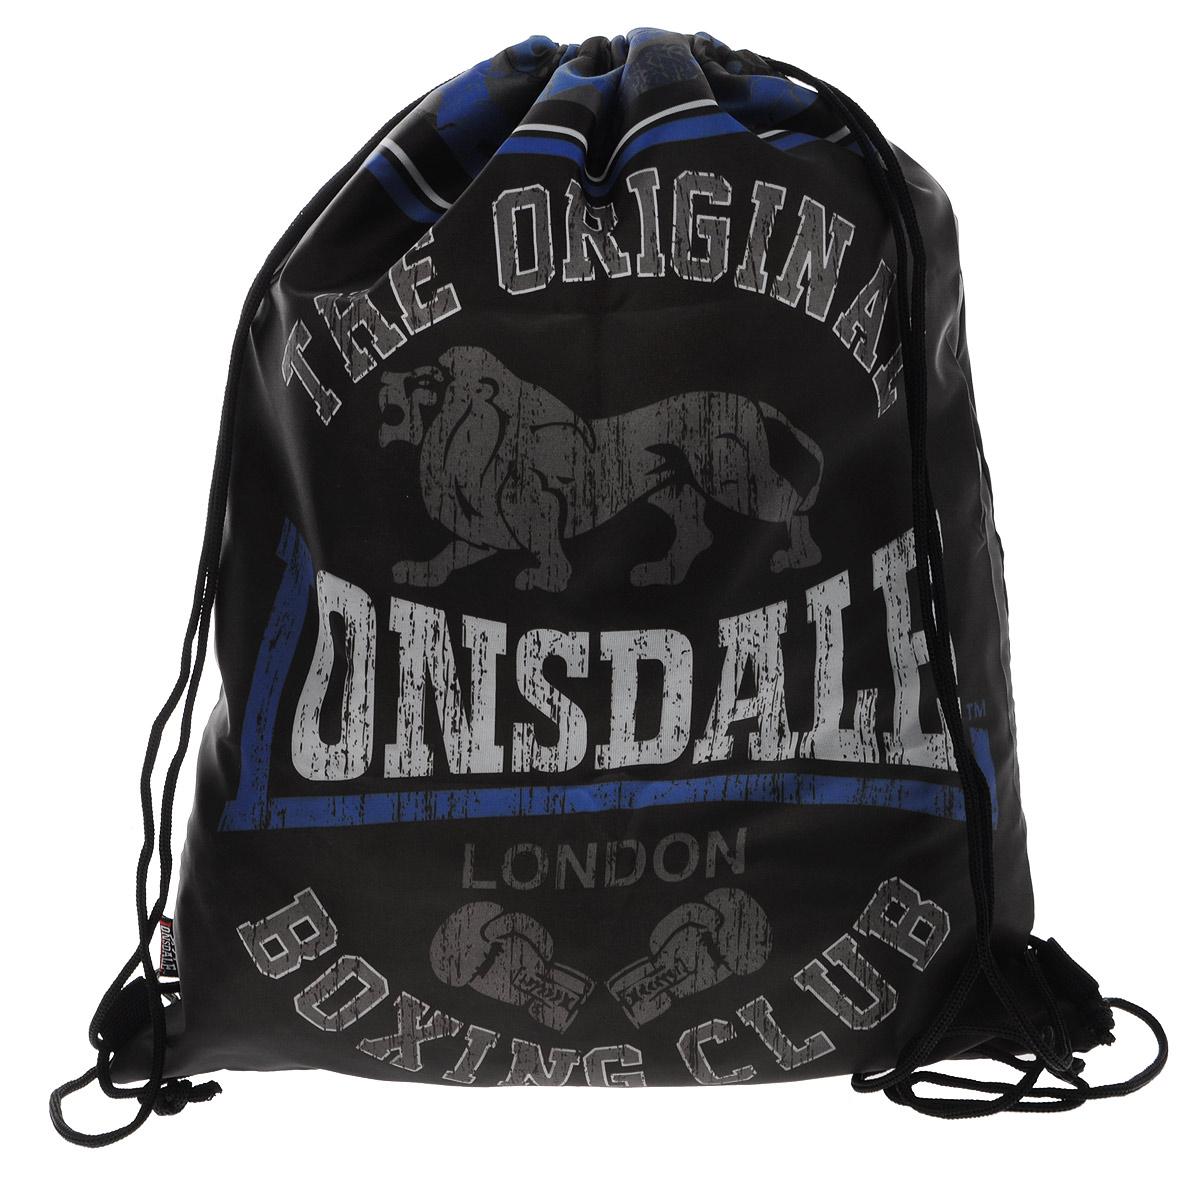 Lonsdale Сумка-рюкзак для обуви цвет черно-голубой LSCB-UT1-883